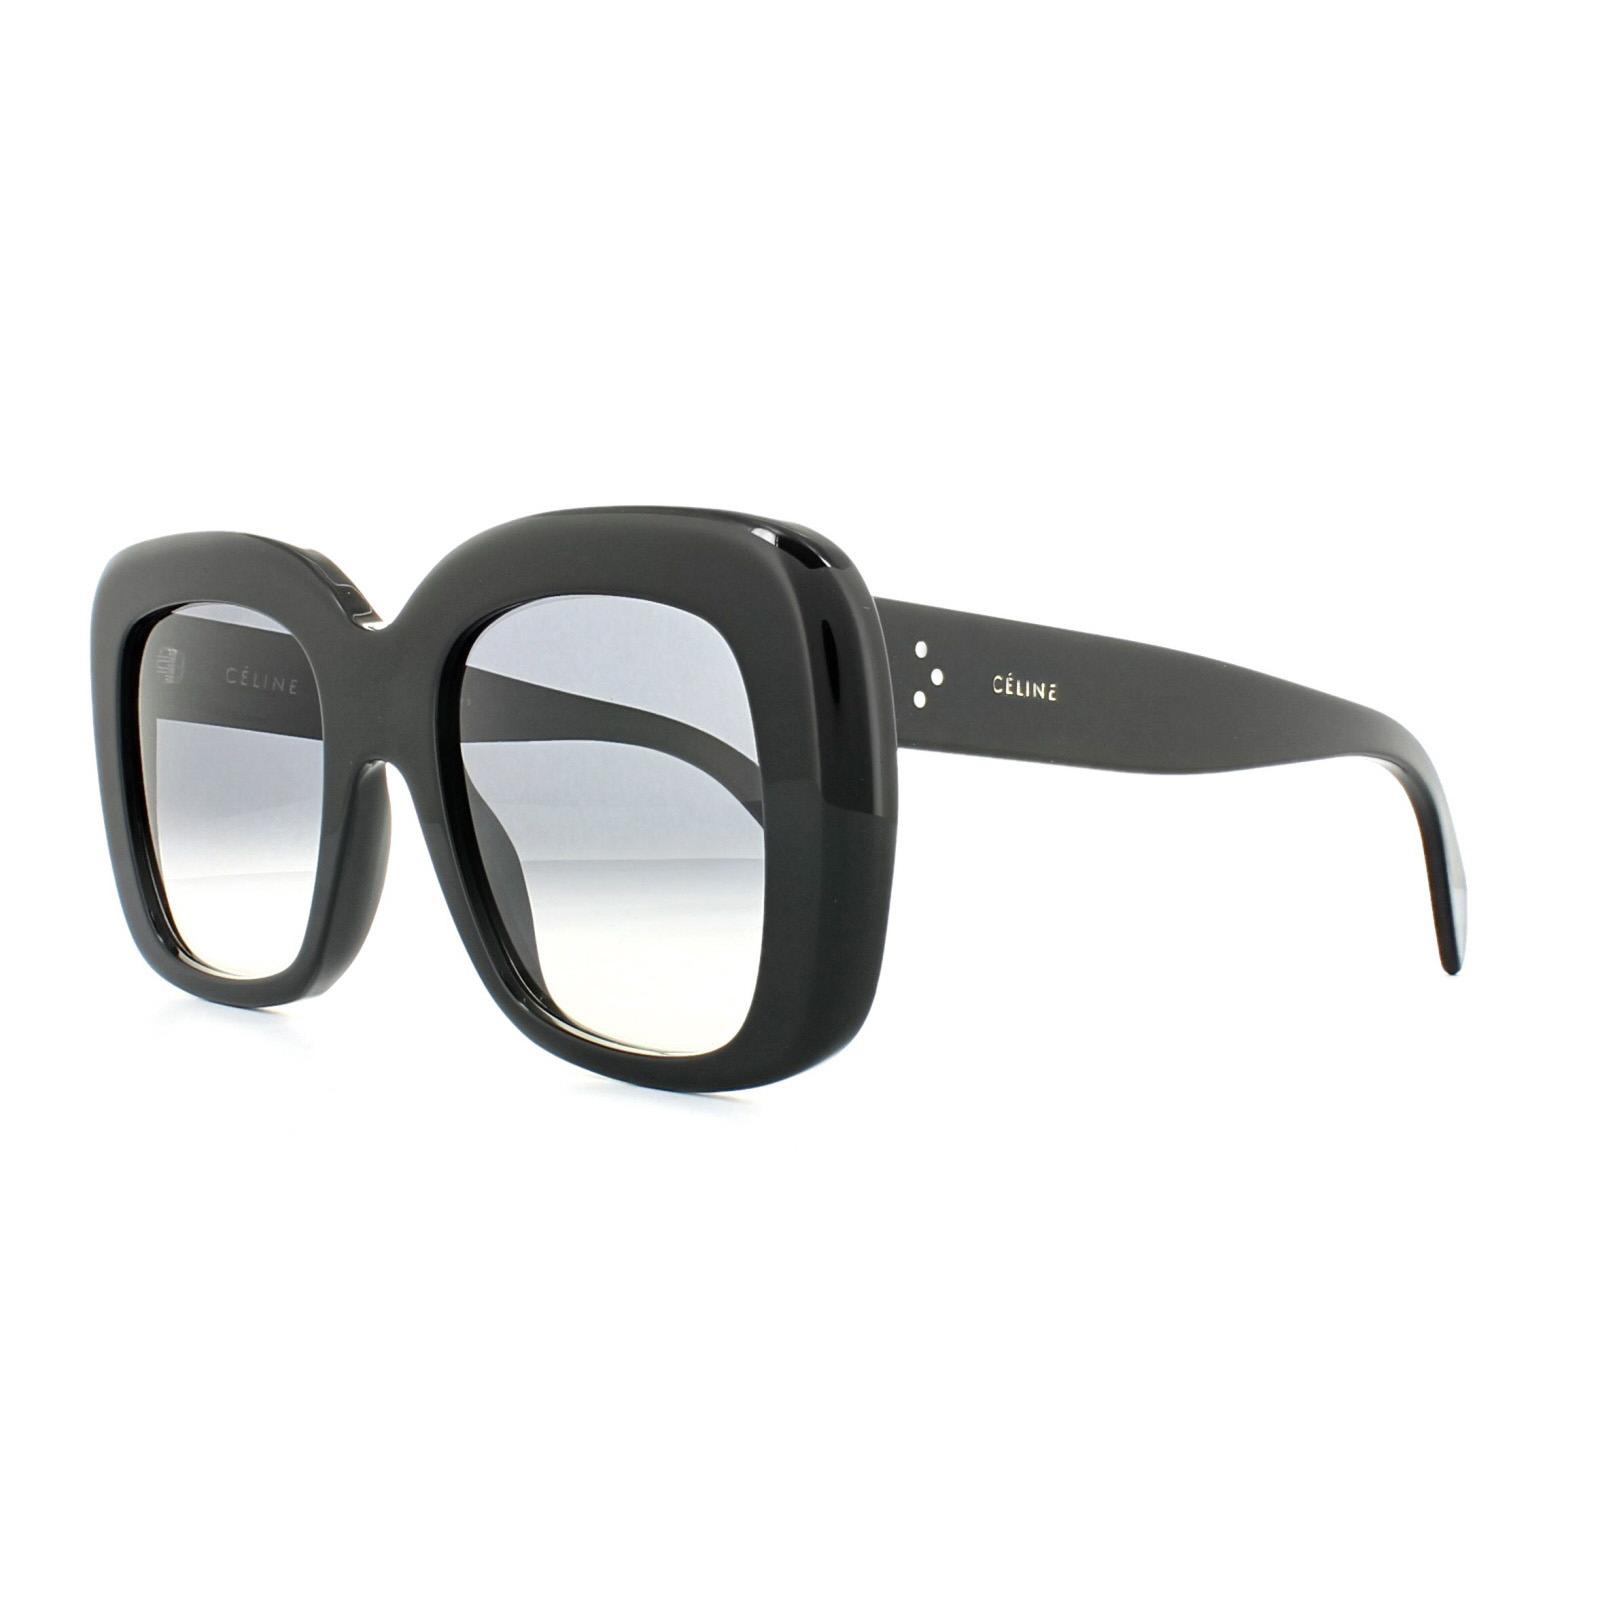 c02b7266236b Sentinel Celine Sunglasses 41433/S Stella 807 W2 Black Dark Grey Gradient